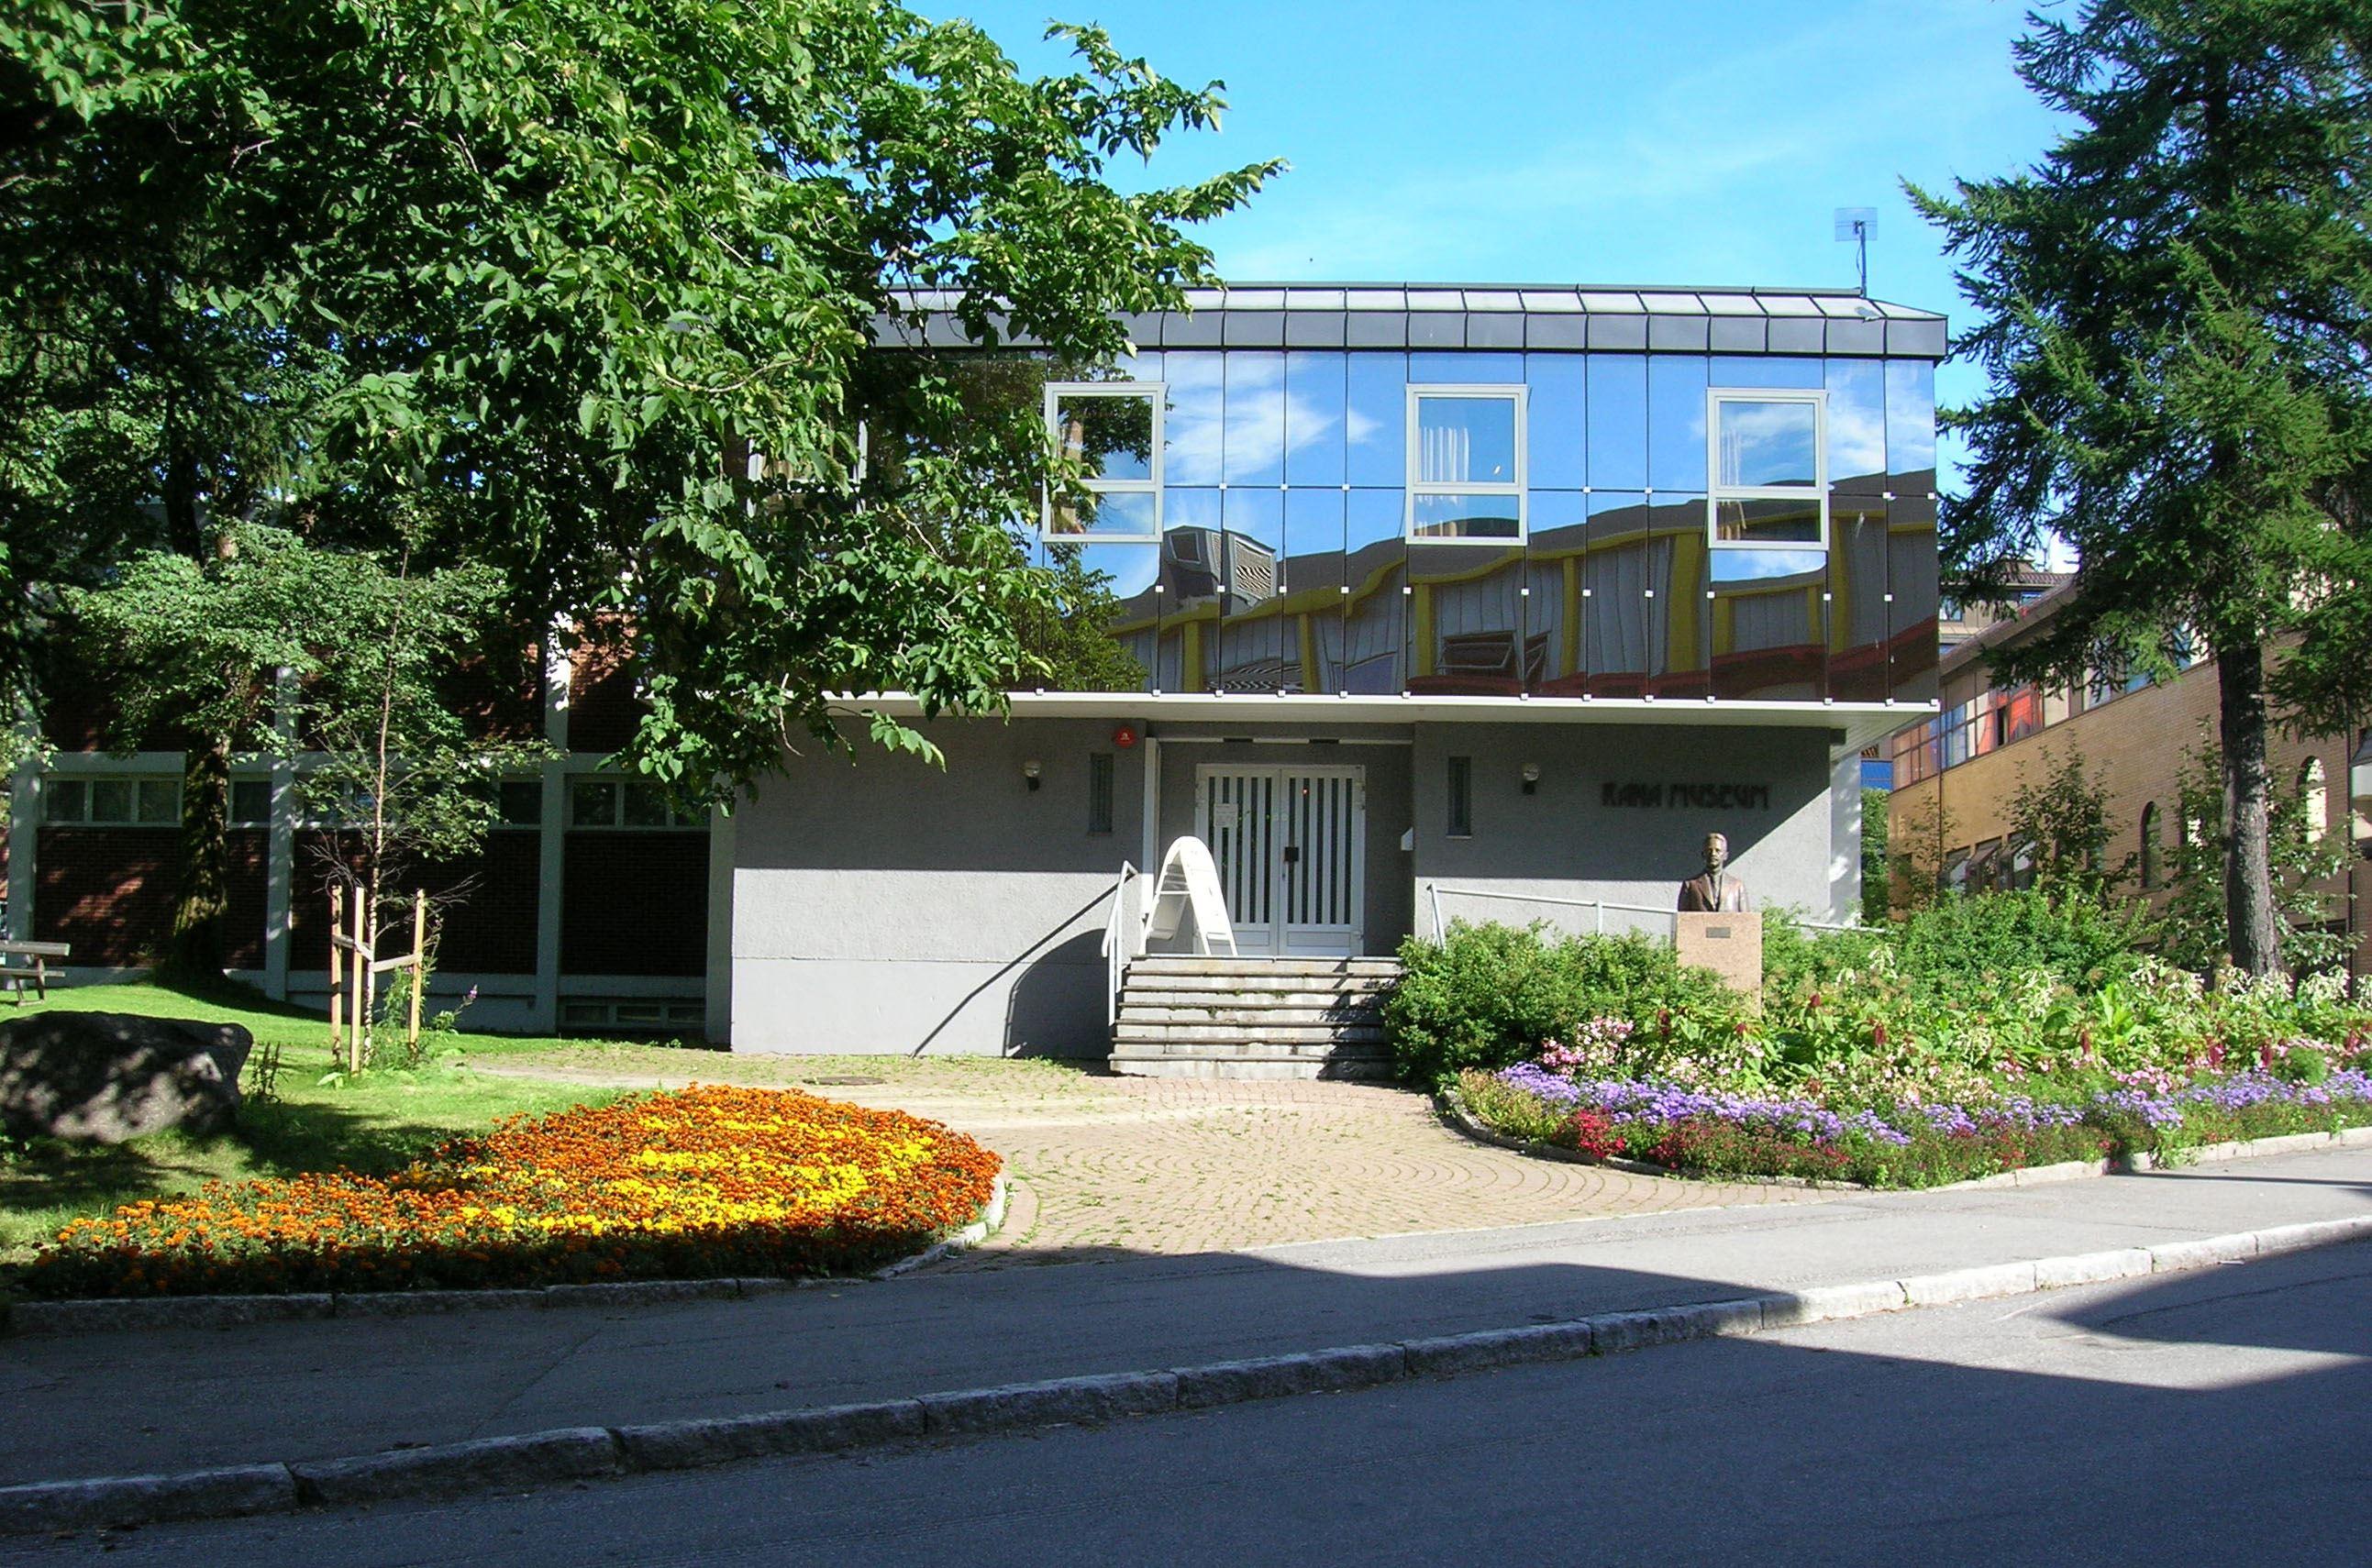 Helgeland Museum avd. Rana